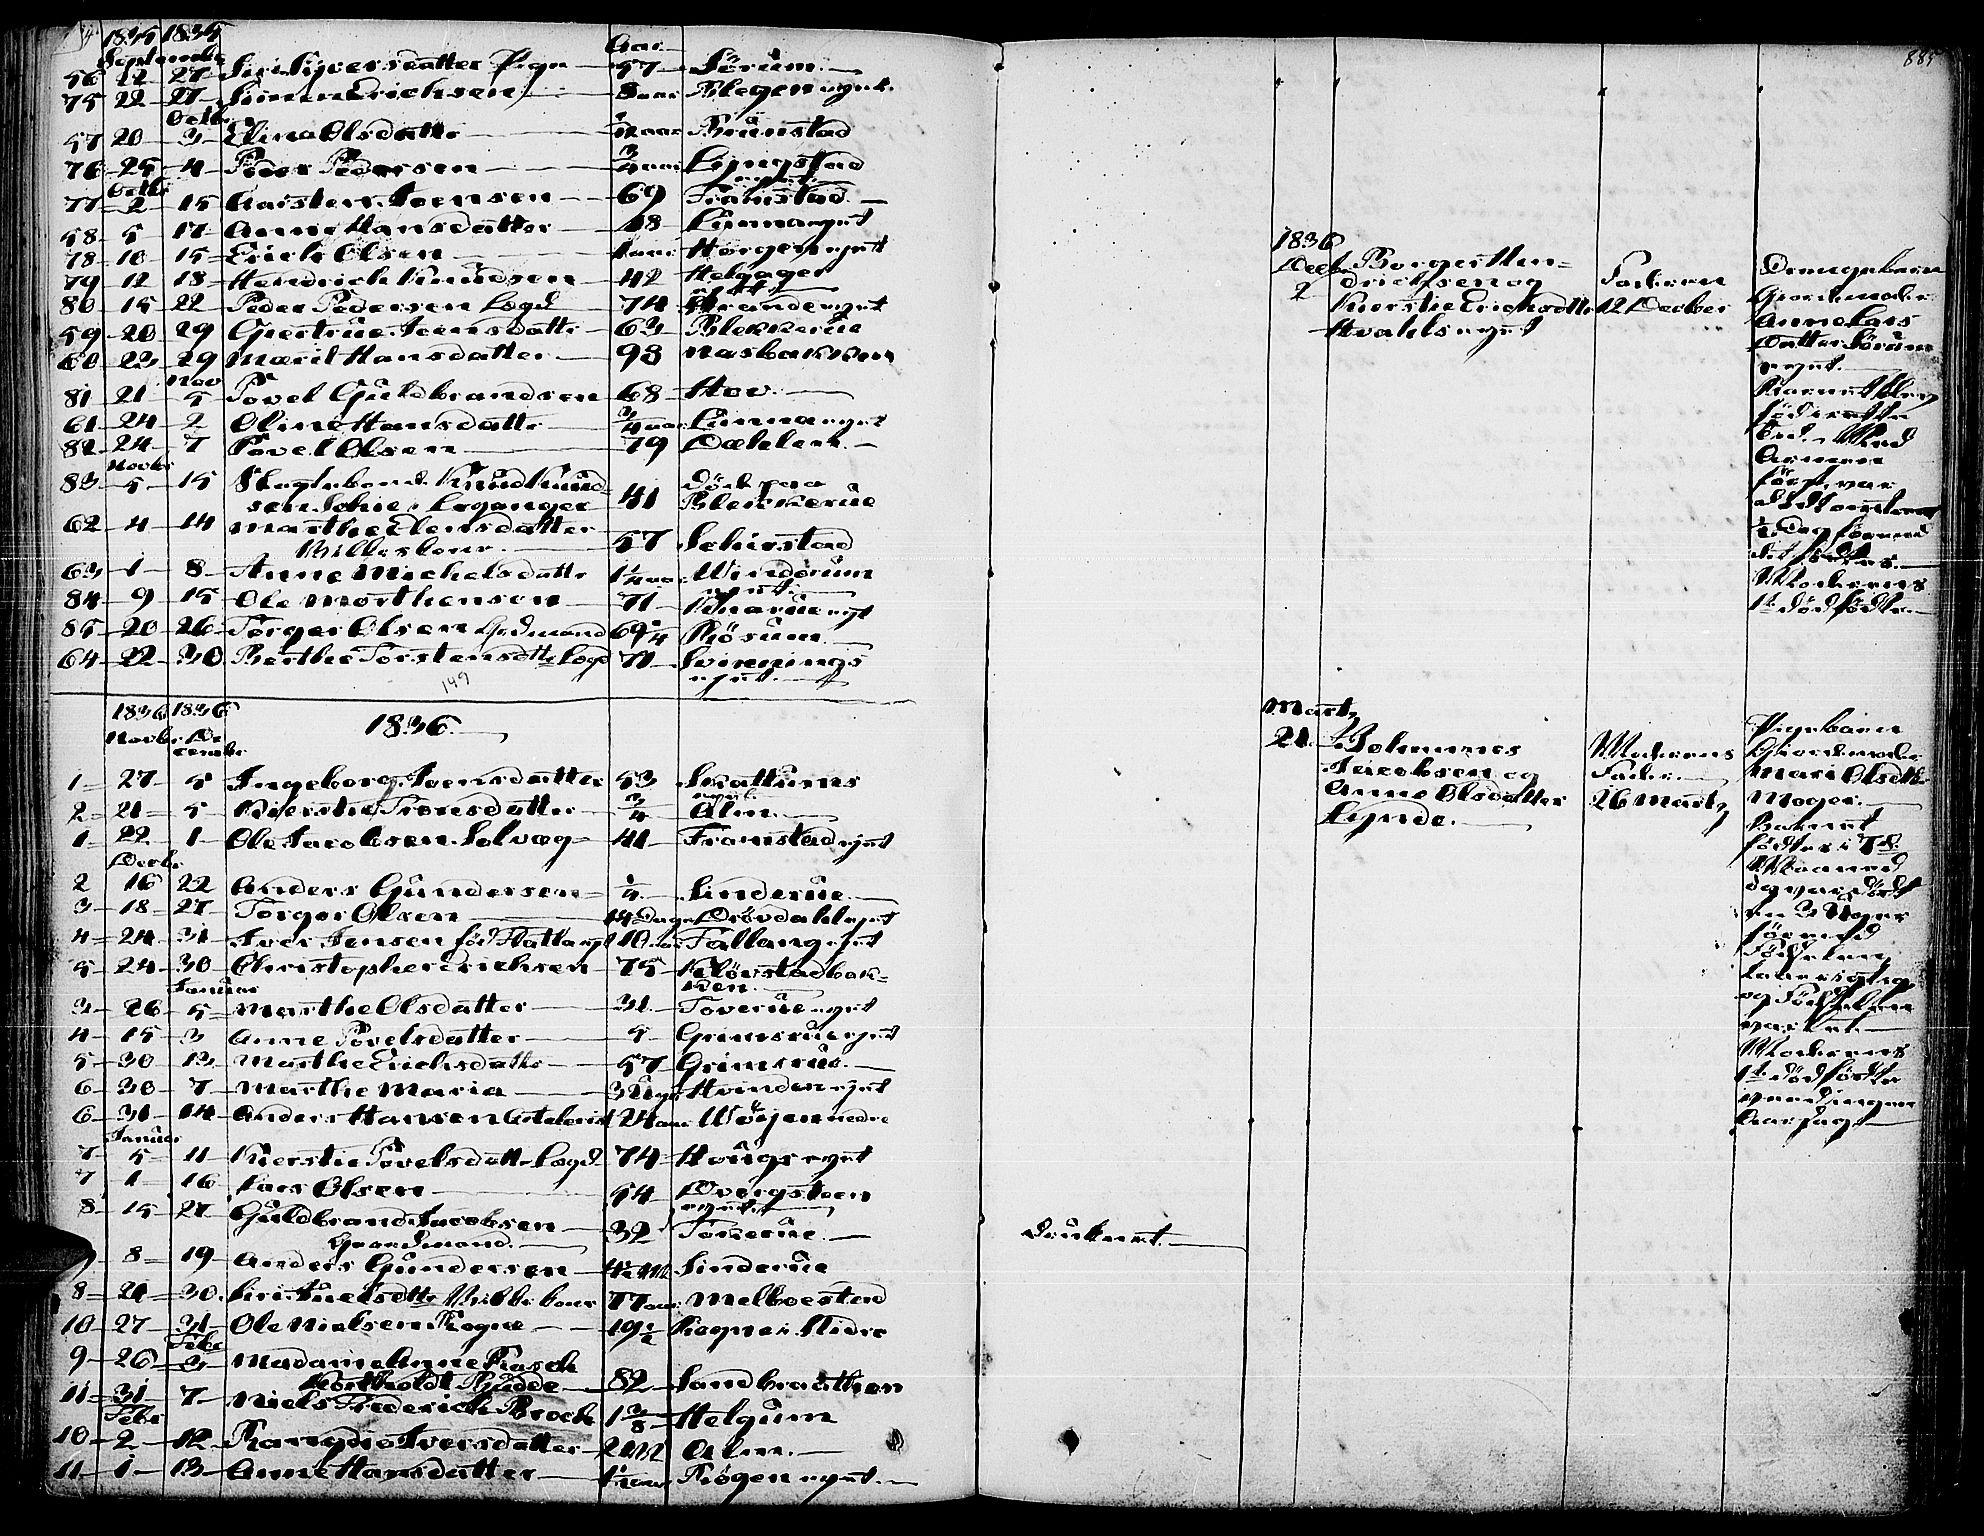 SAH, Gran prestekontor, Ministerialbok nr. 10, 1824-1842, s. 884-885